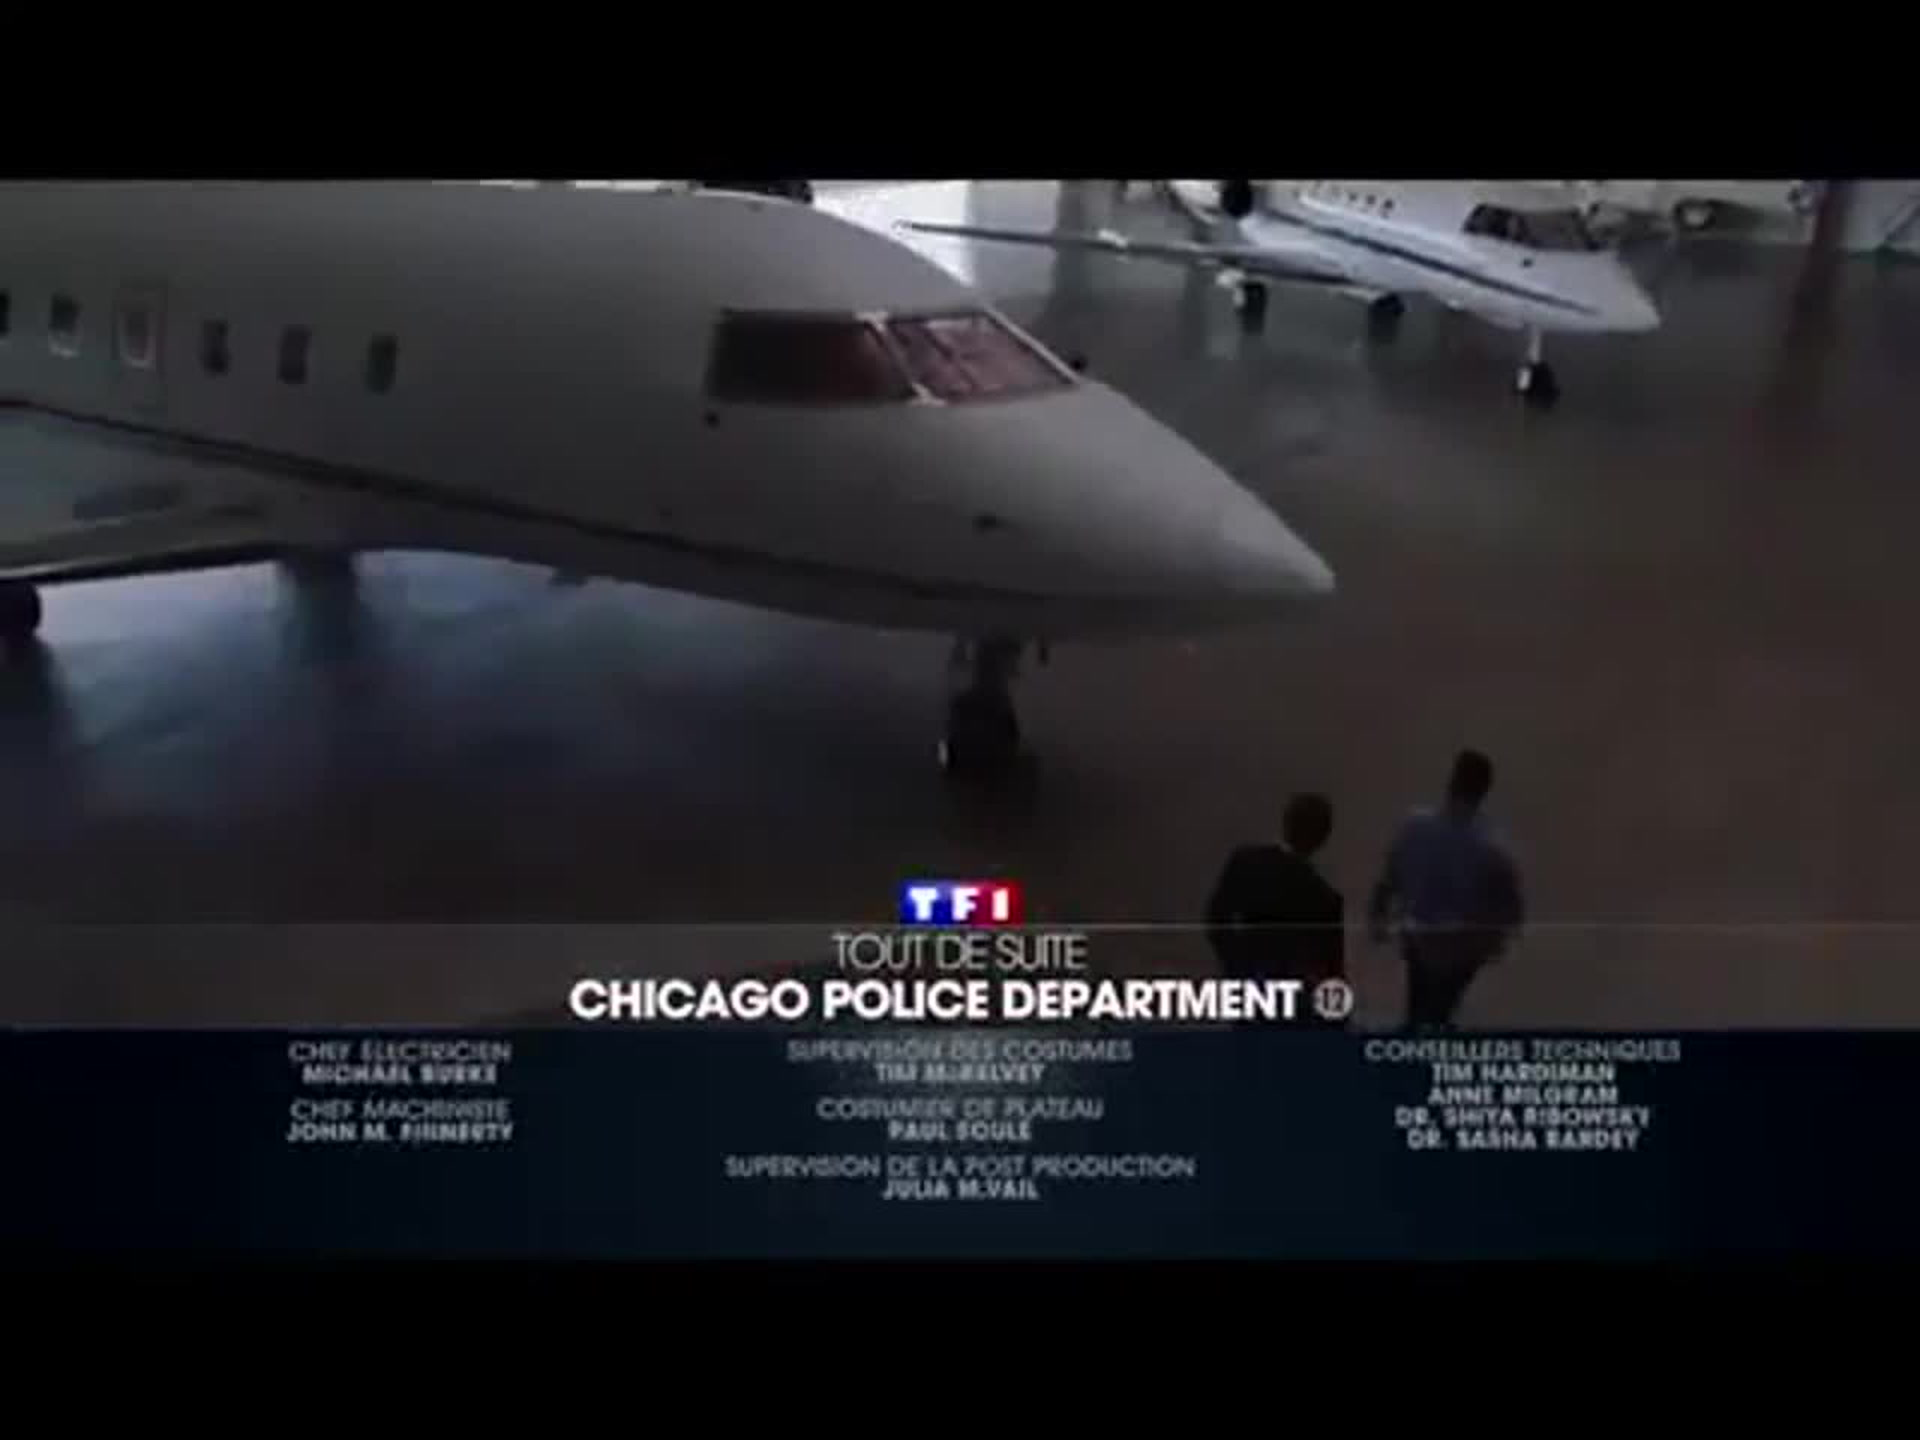 Chicago Police Department : L'échange